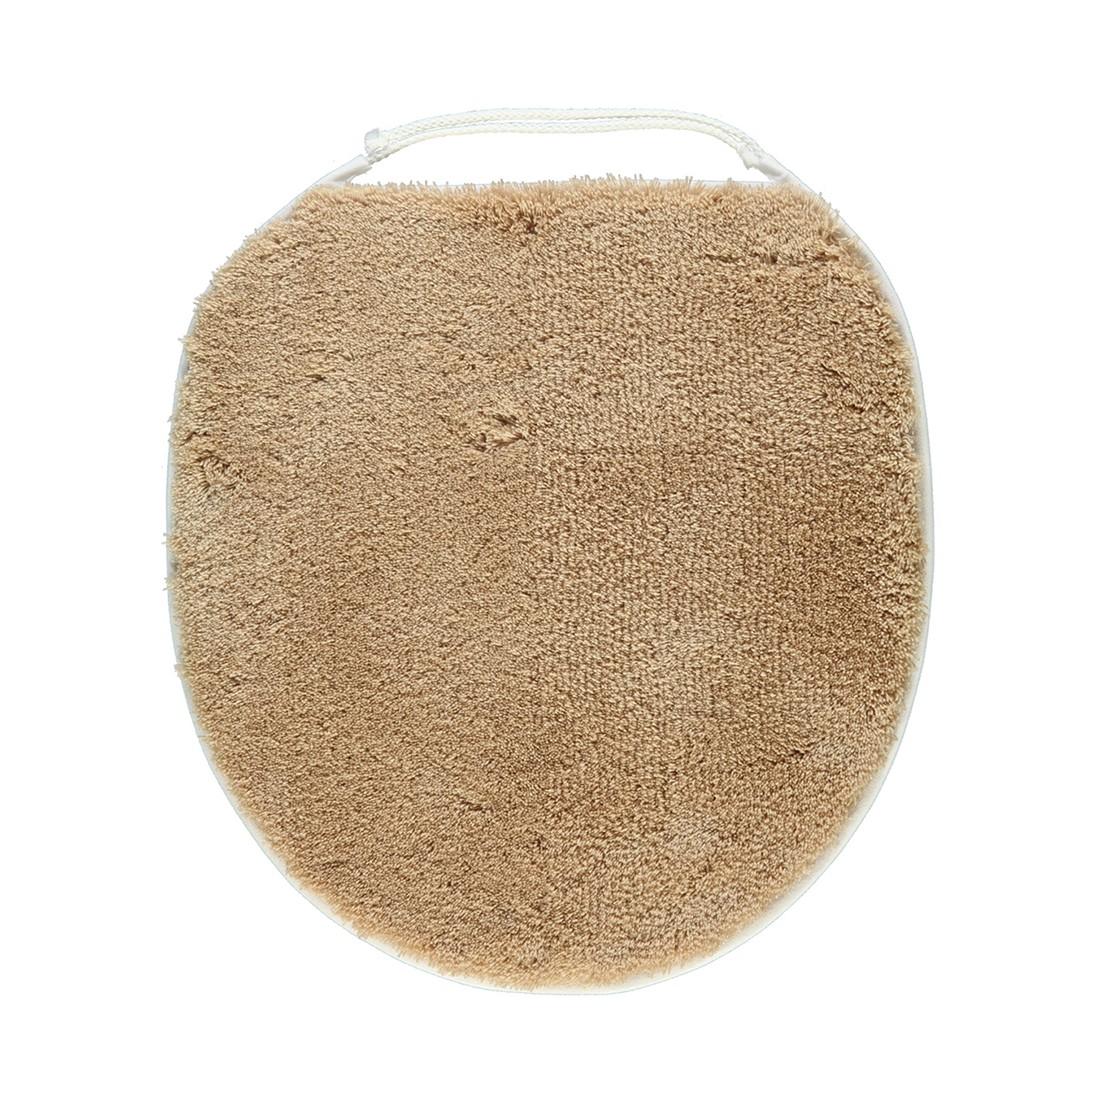 Deckelbezug Soft – 100% Polyacryl Berberbeige – 217, Kleine Wolke online kaufen